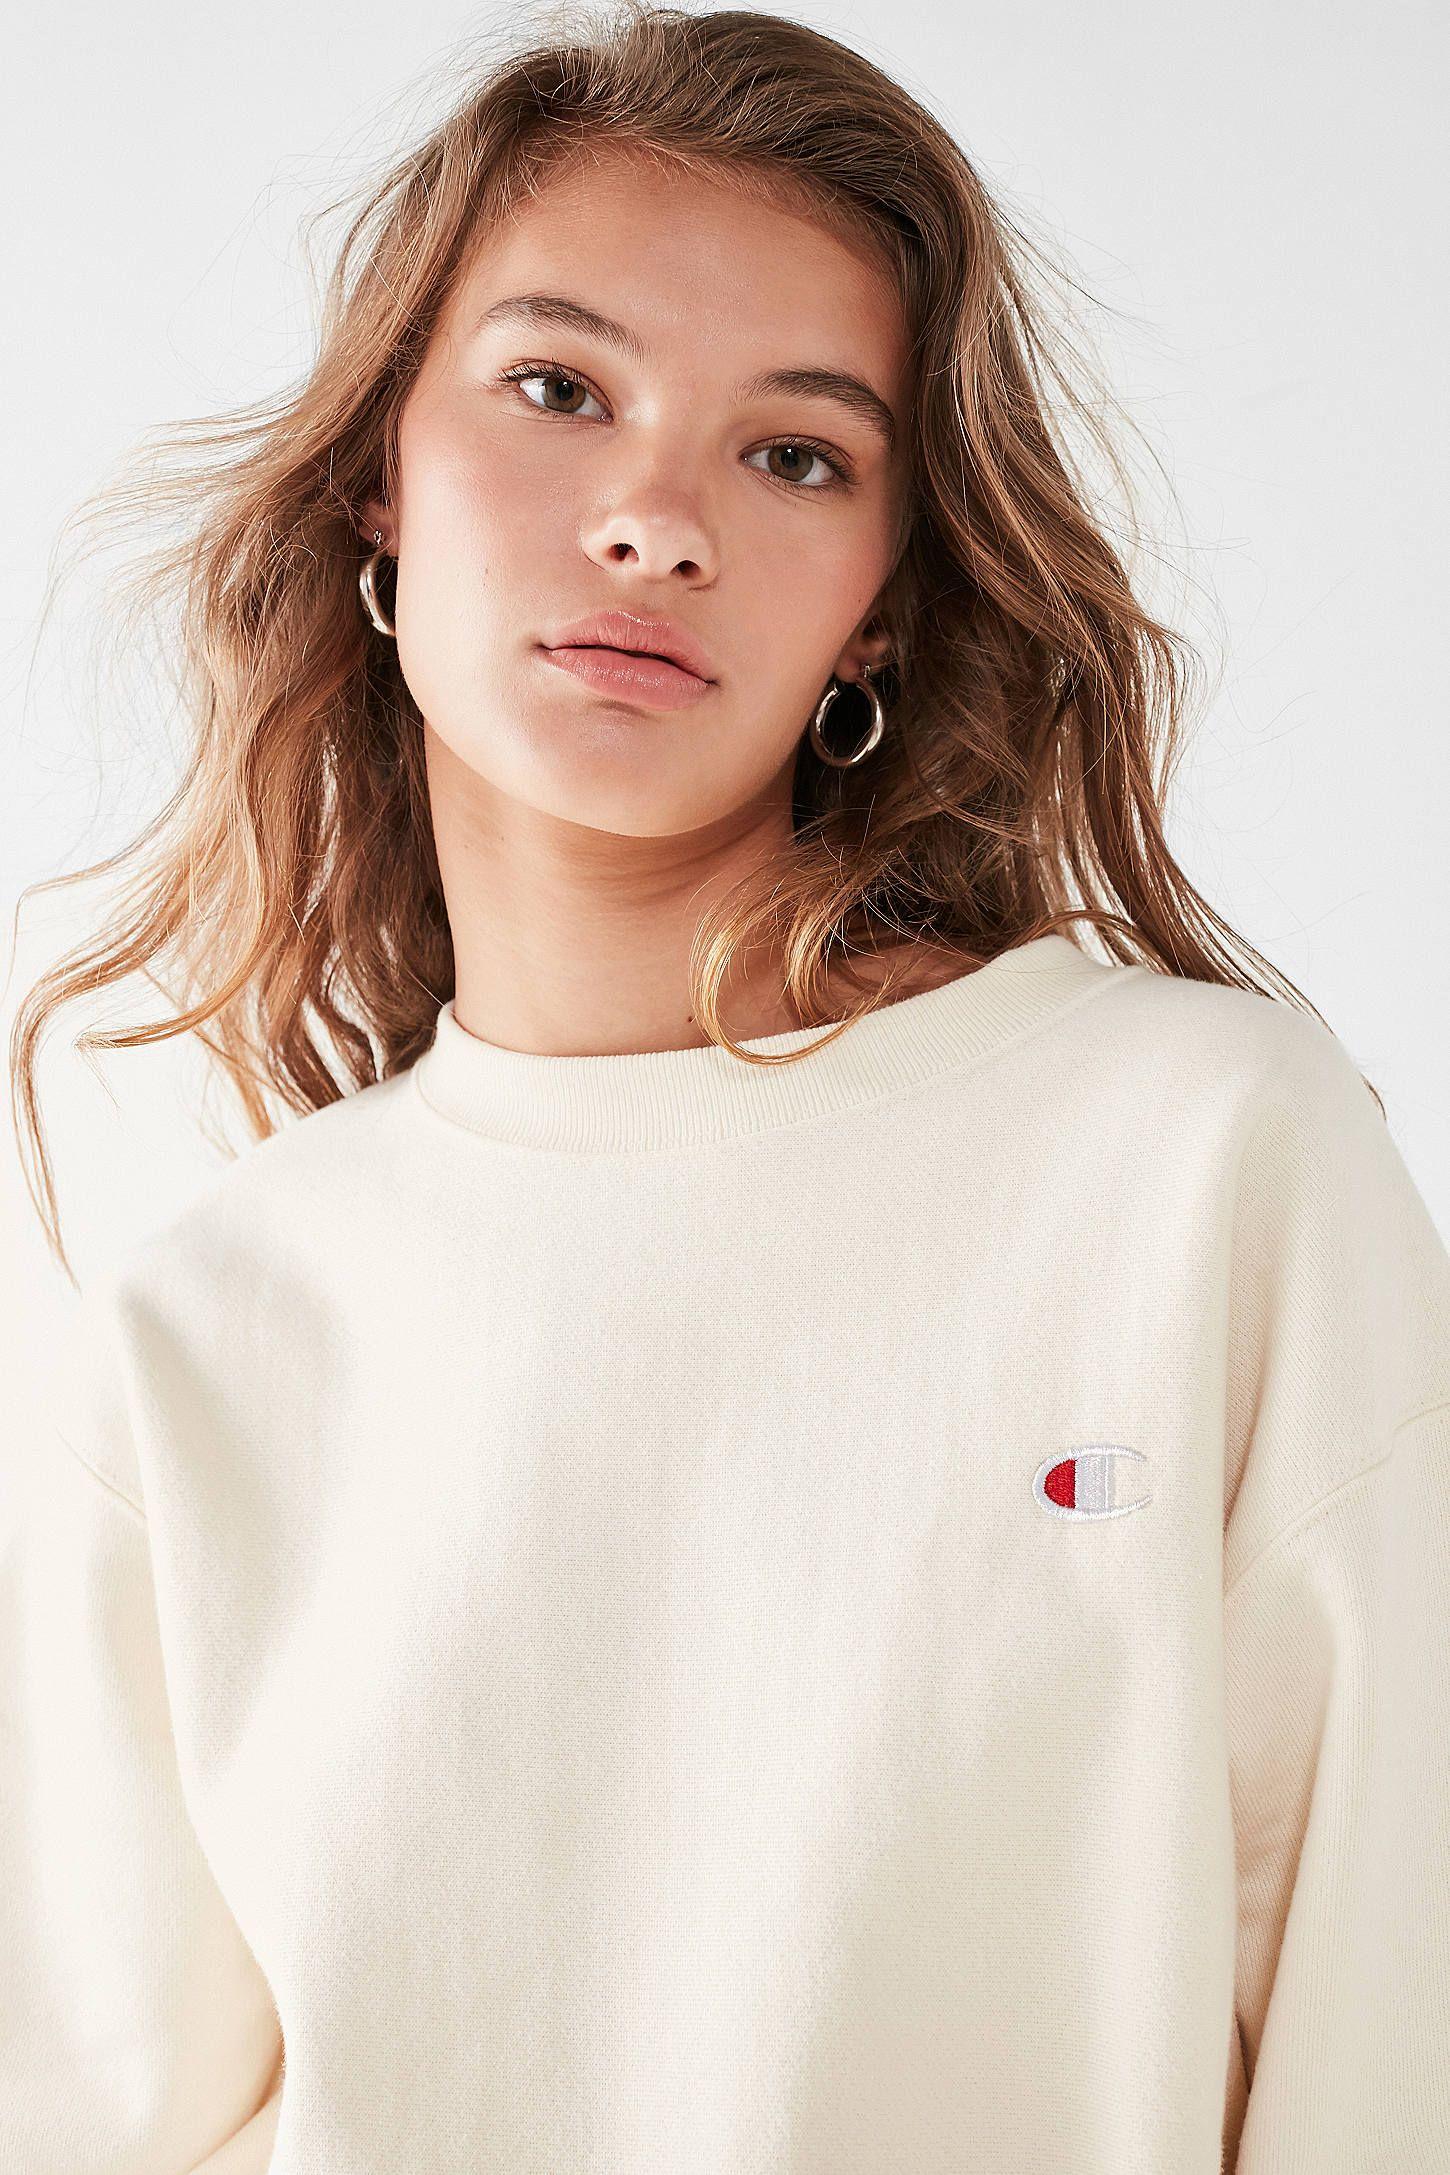 Champion Uo Reverse Weave Pullover Sweatshirt Pullover Sweatshirt Champion Pullover Sweatshirts [ 2175 x 1450 Pixel ]